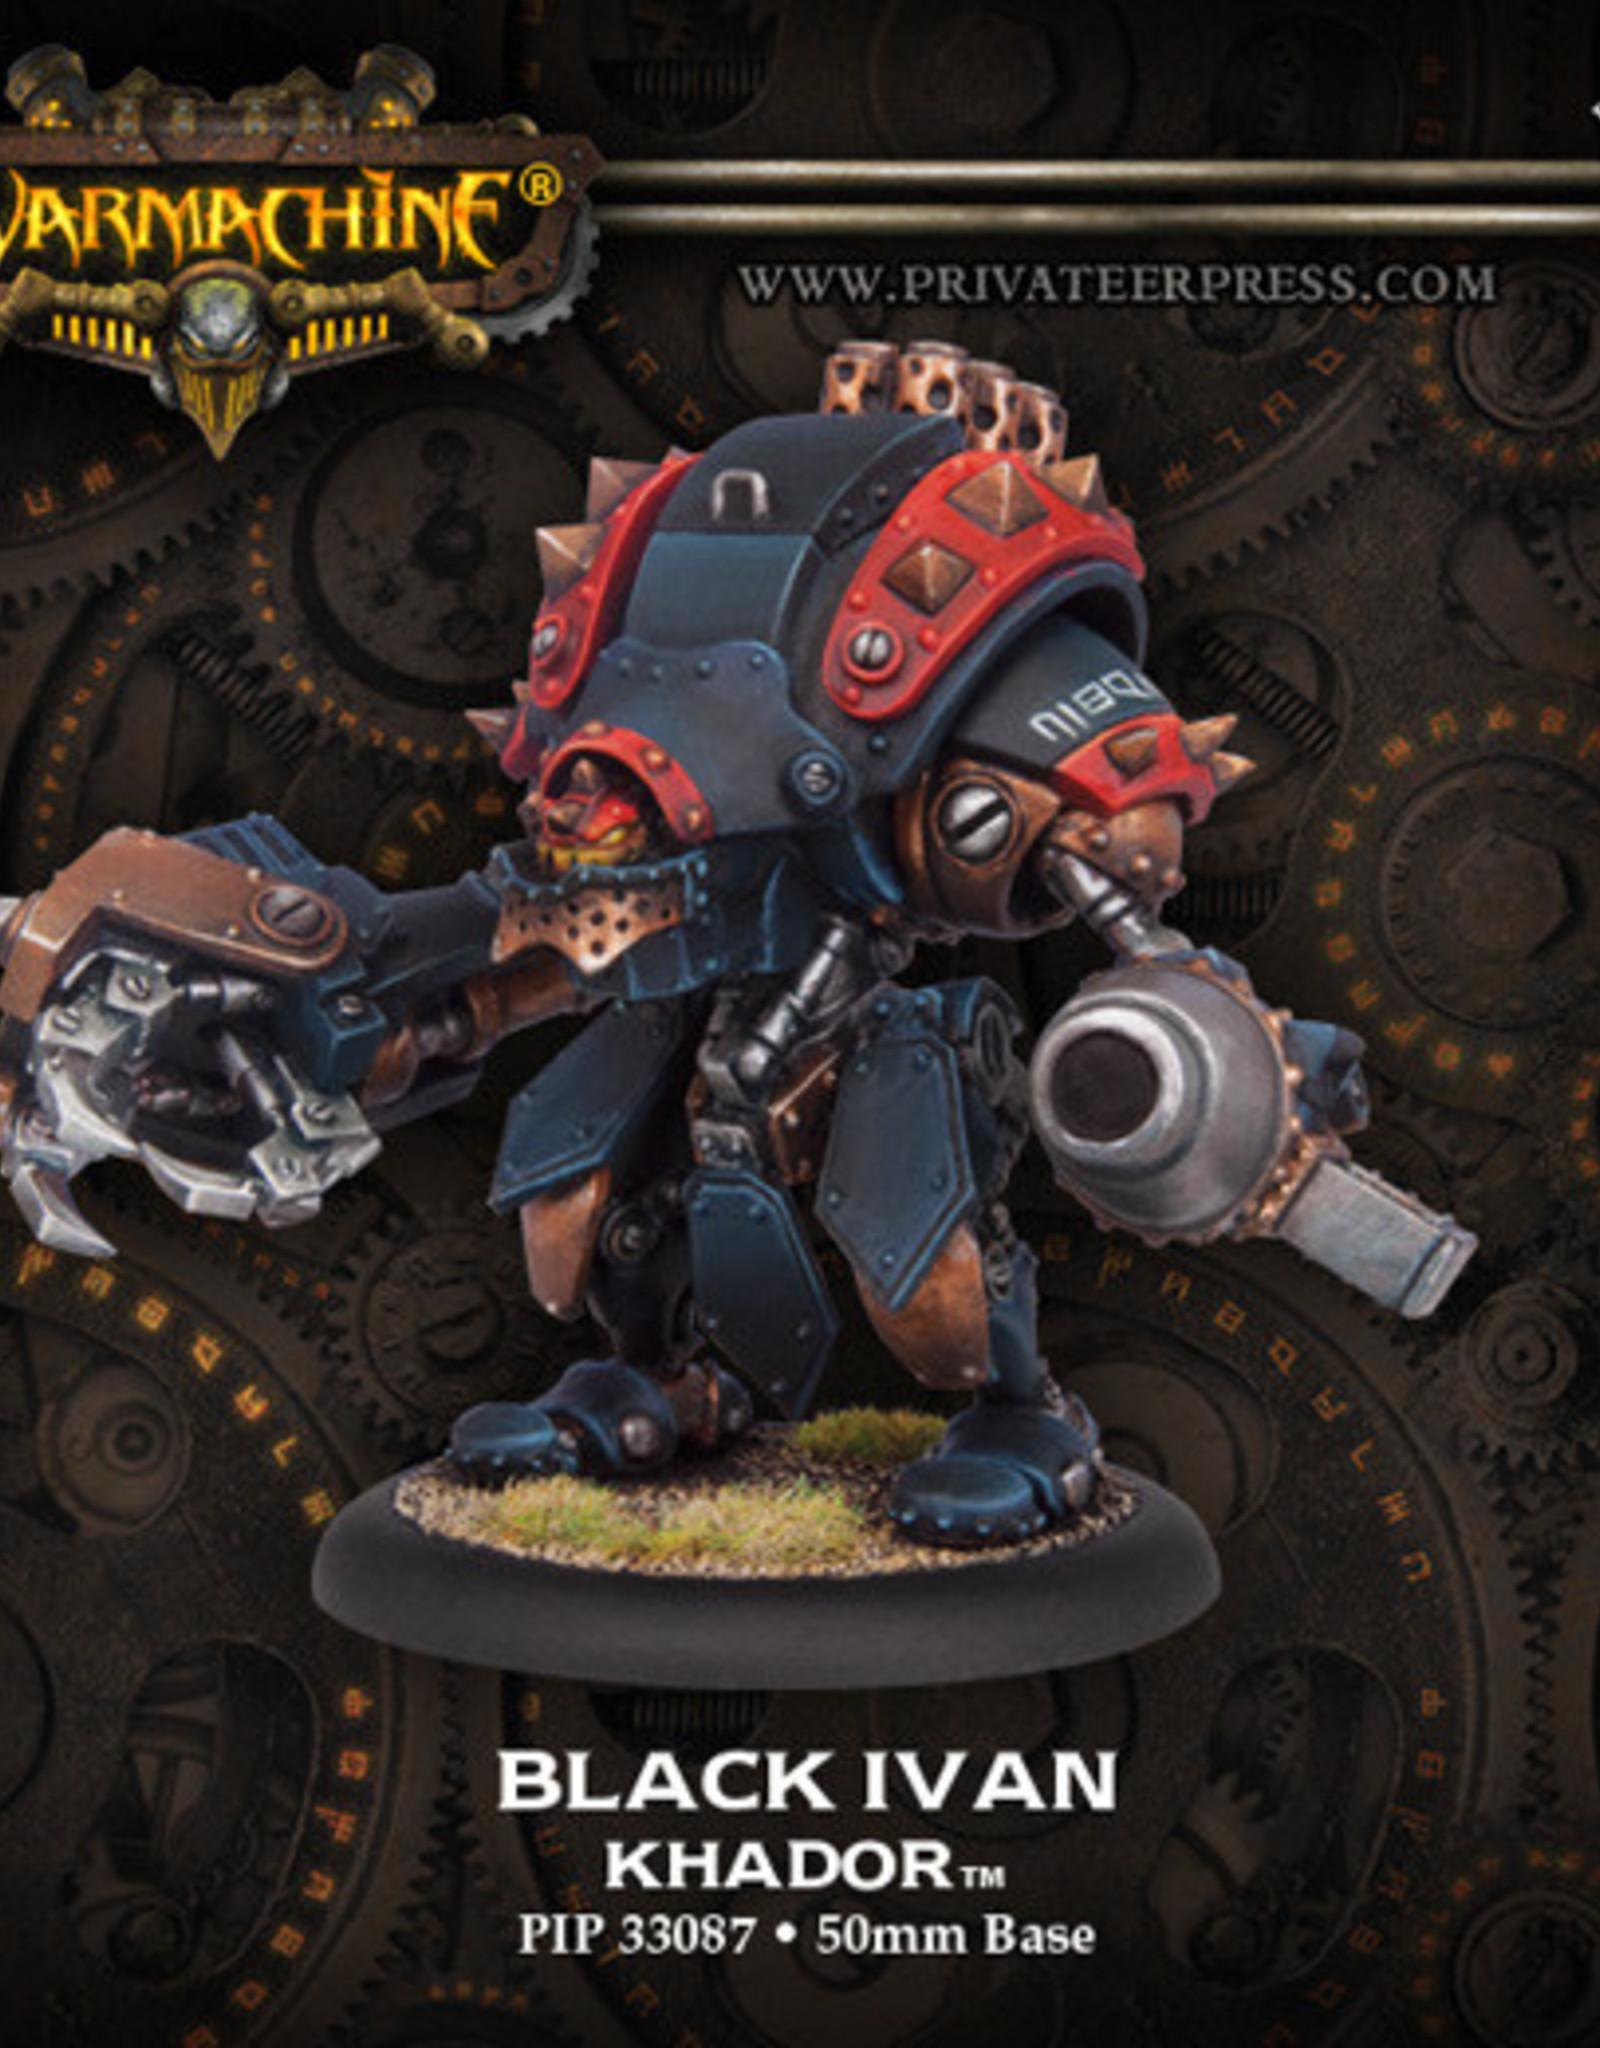 Warmachine Khador - Black Ivan Kit